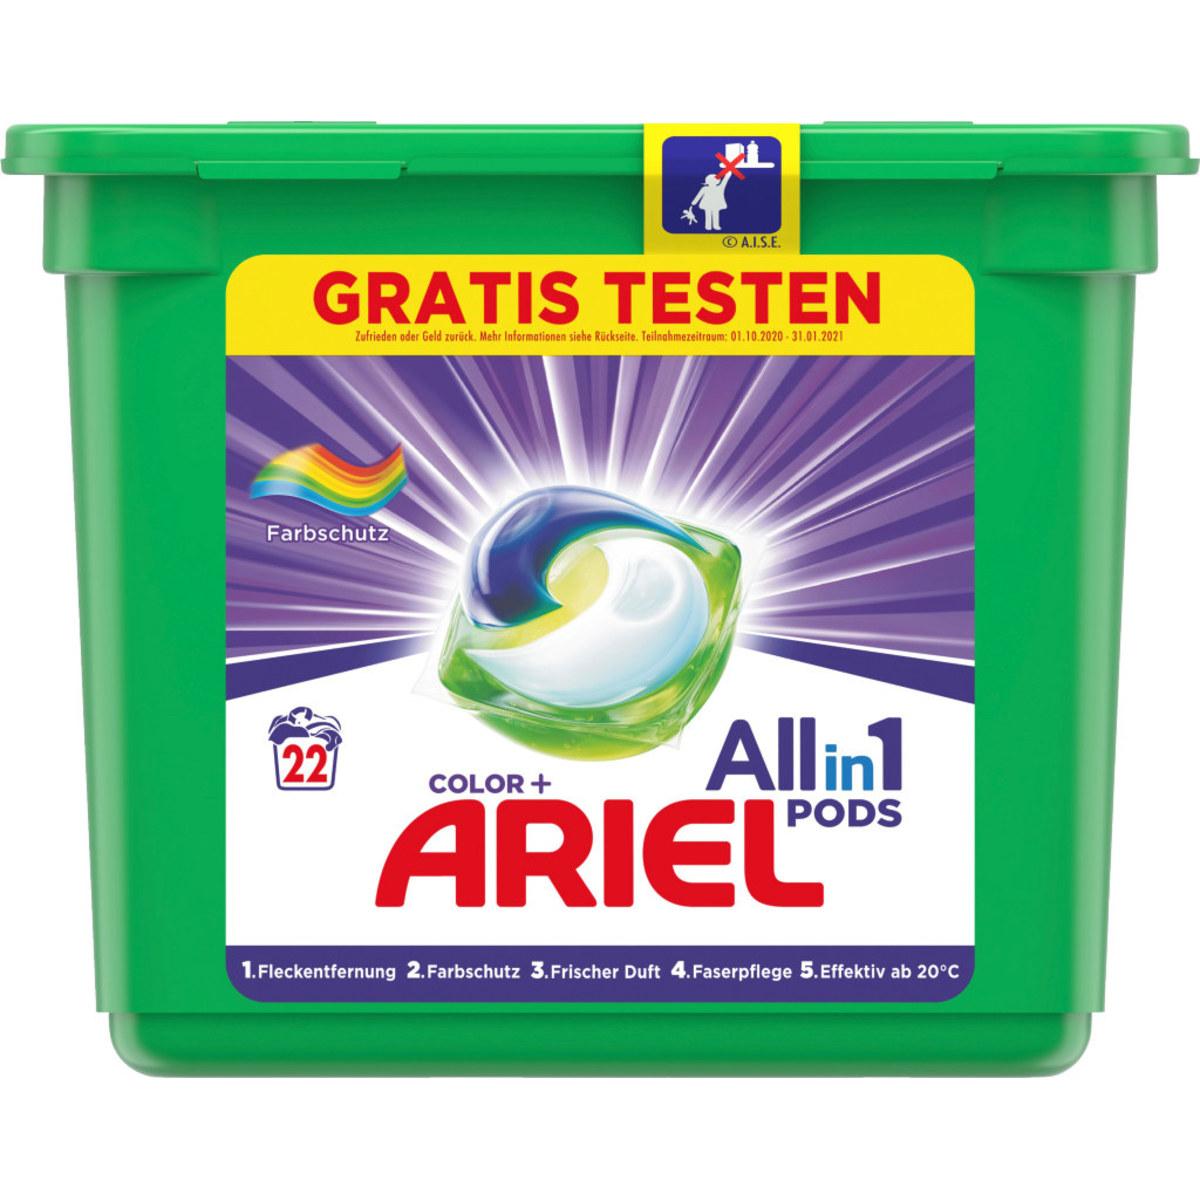 Ariel 3in1 Pods Color     22MB